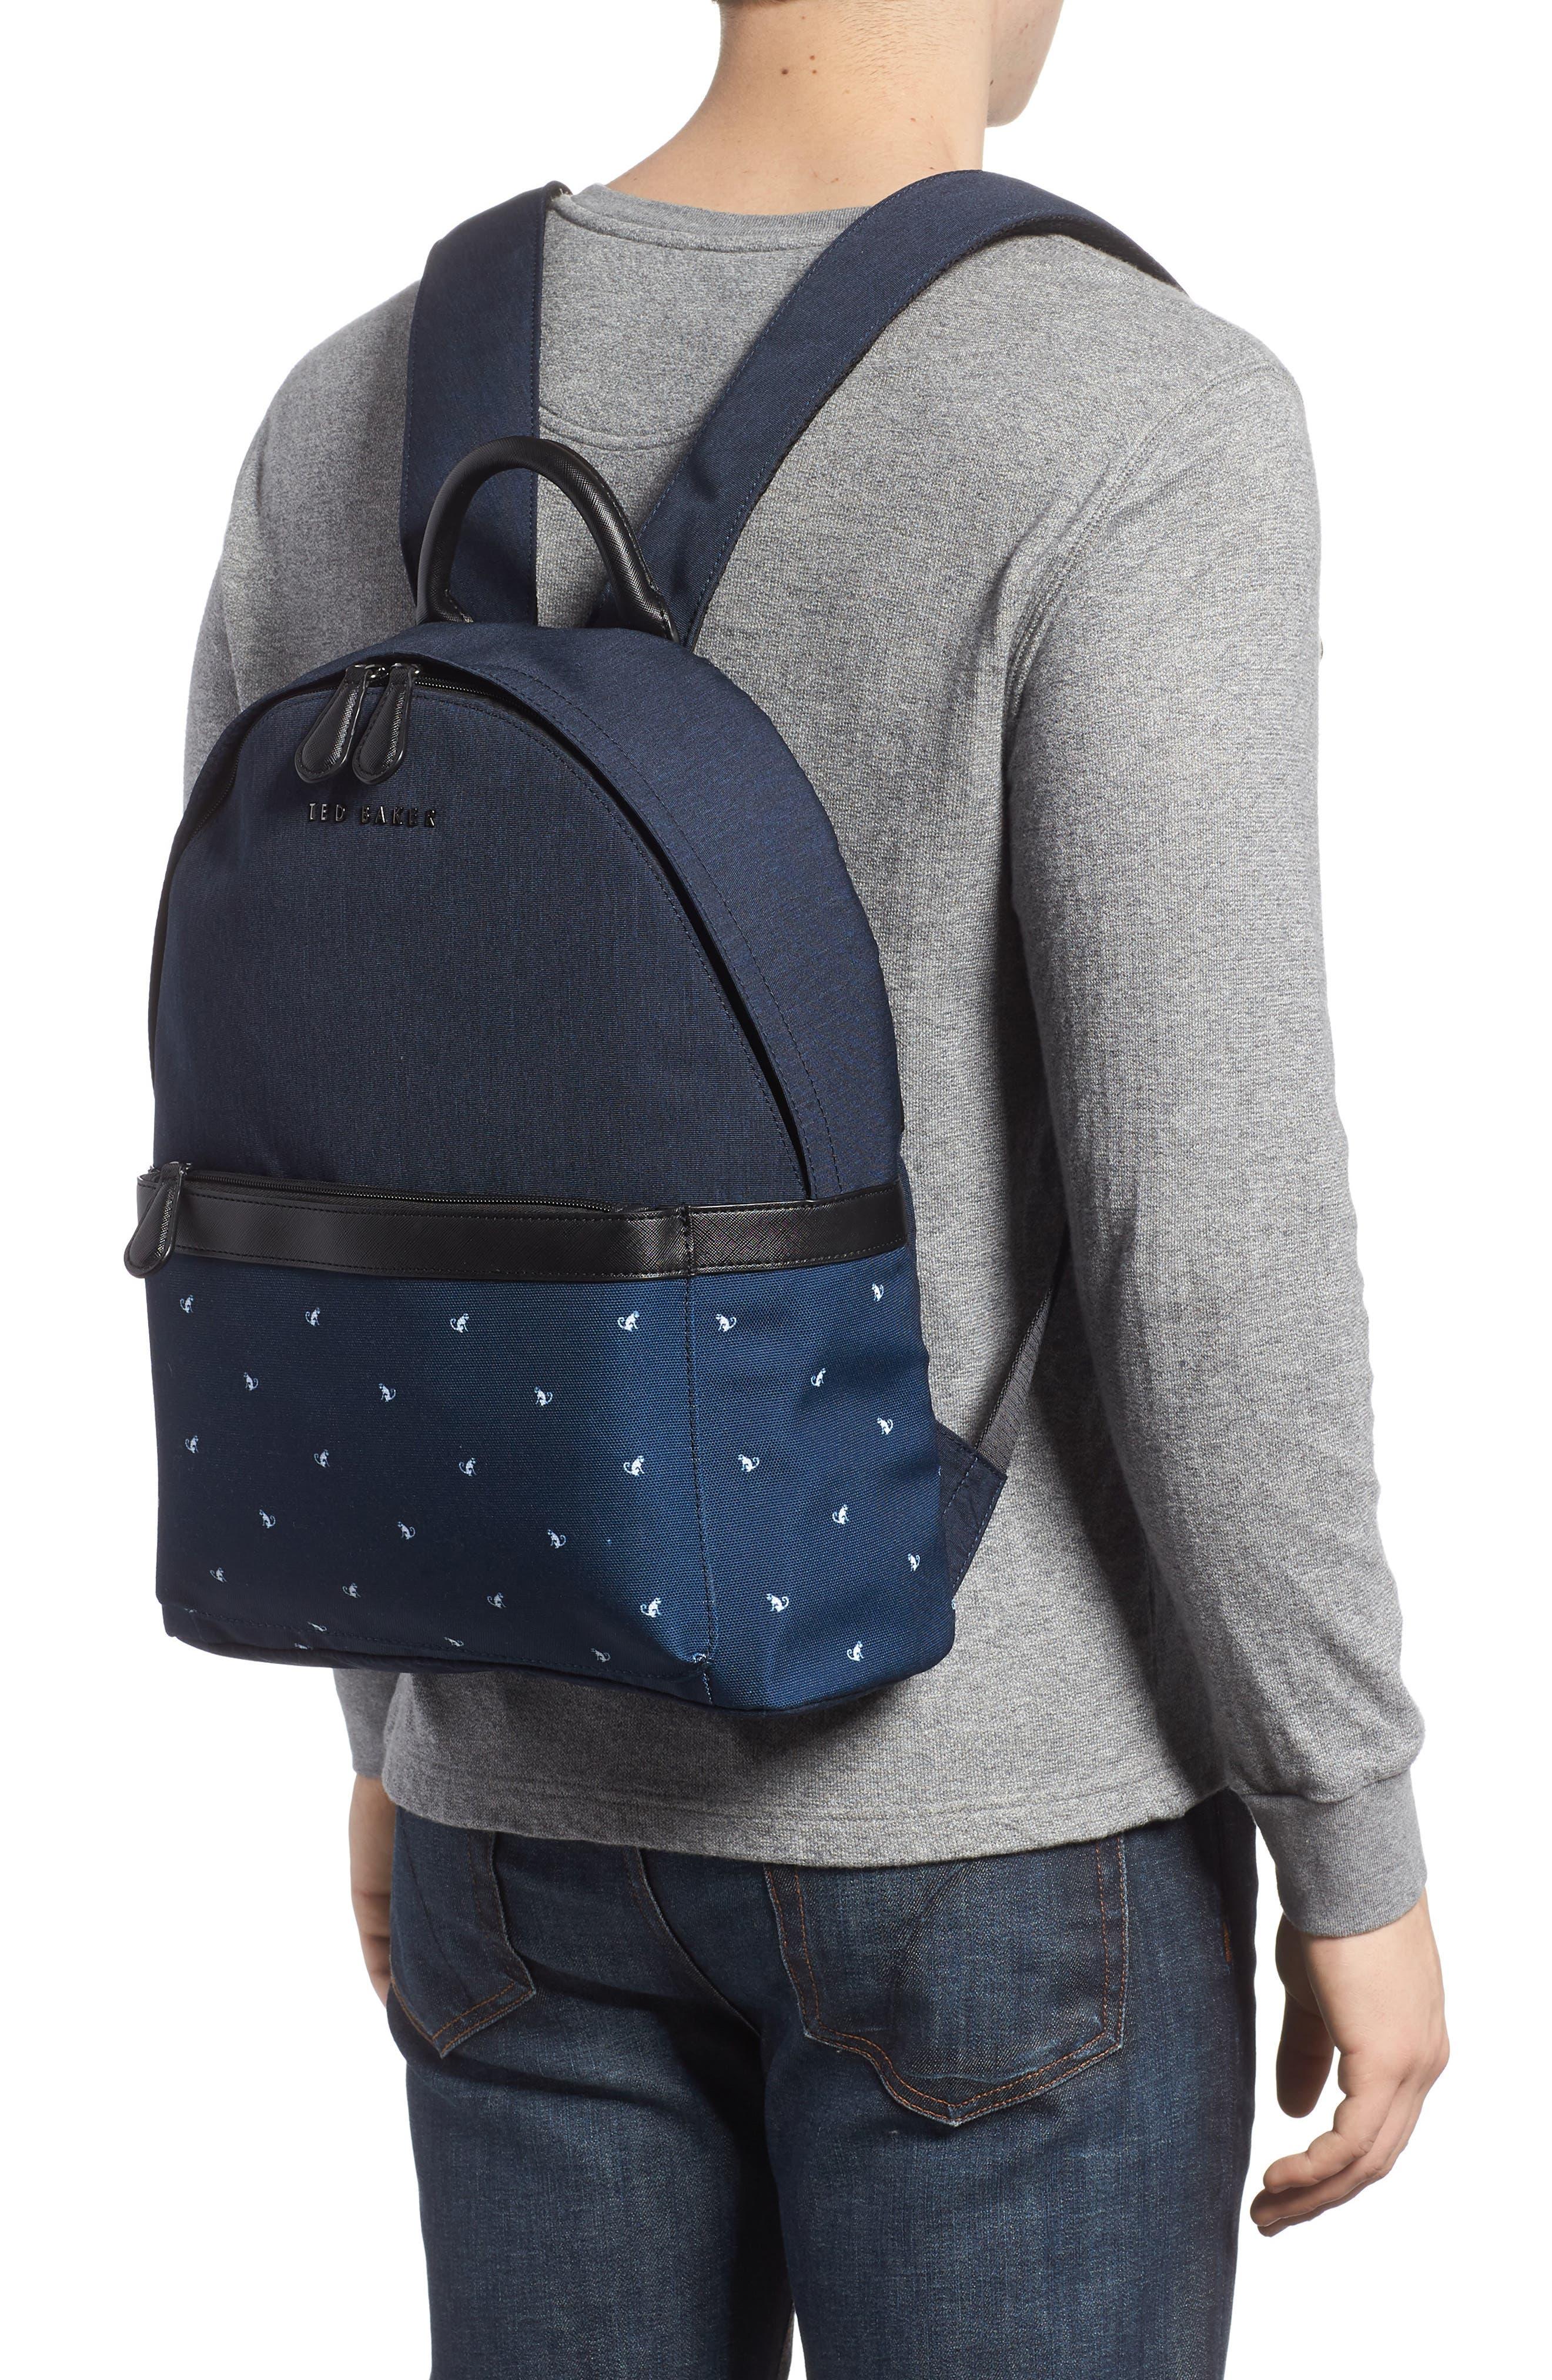 Mangoo Backpack,                             Alternate thumbnail 2, color,                             Navy